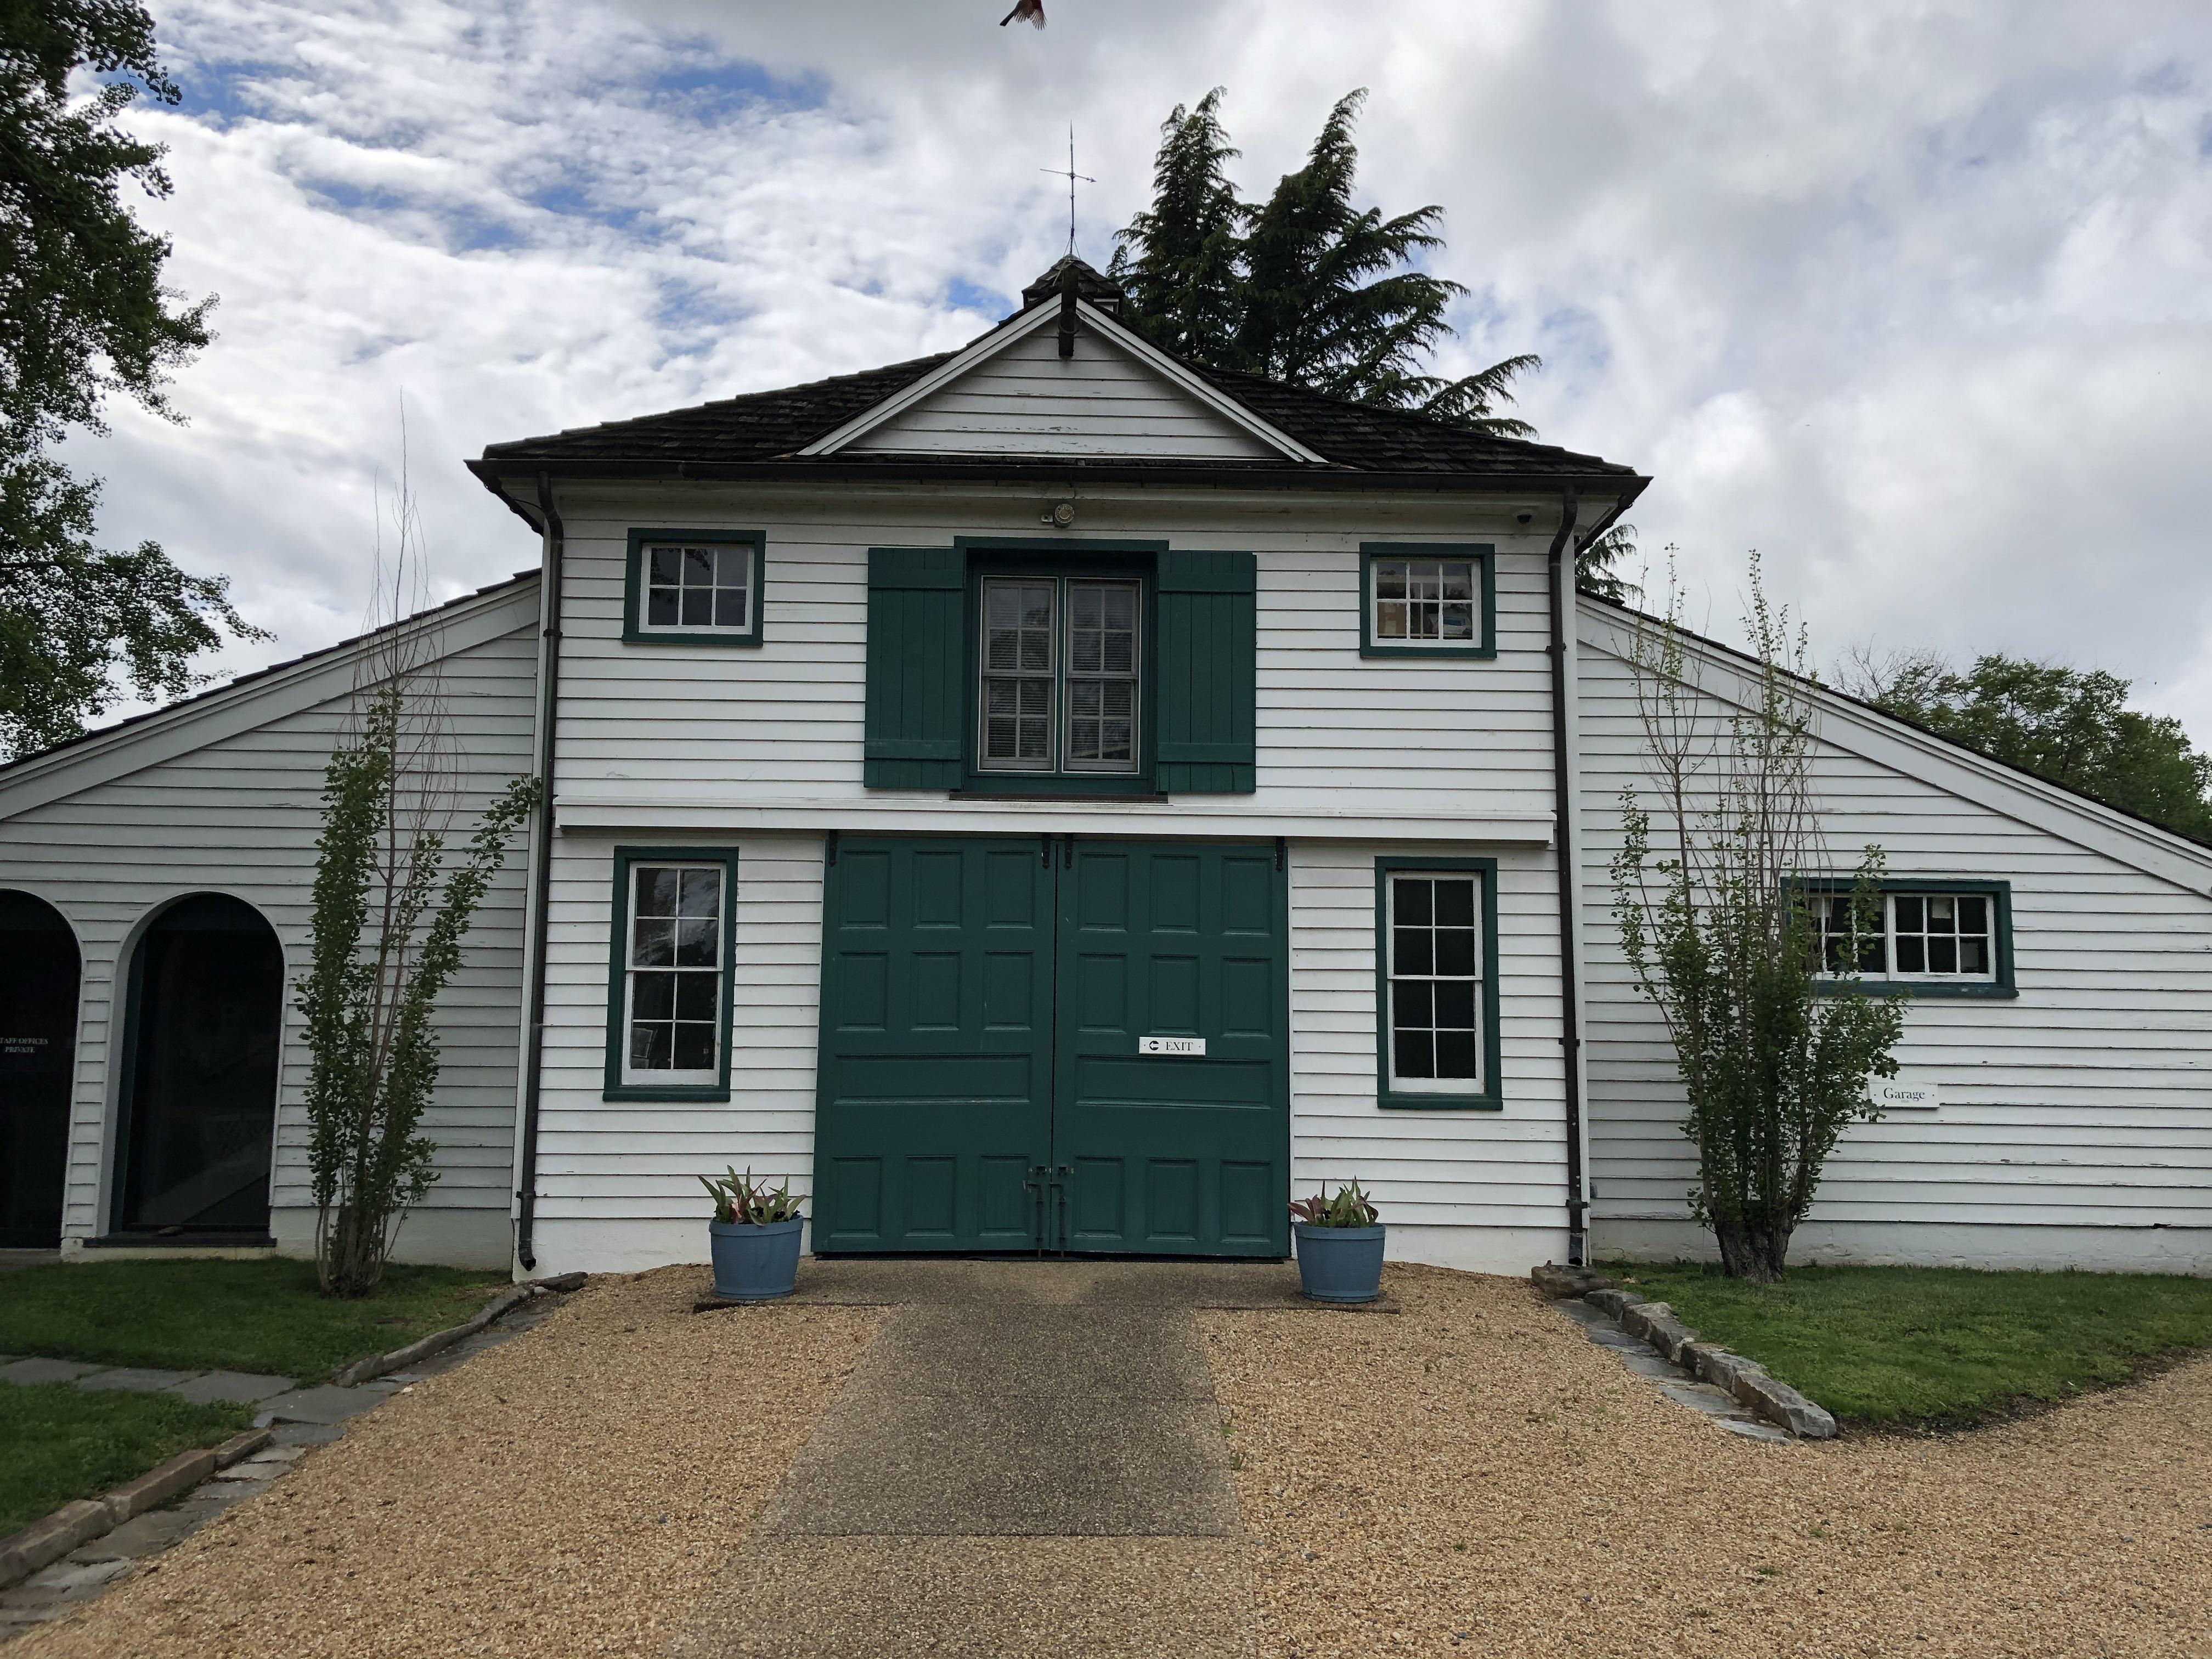 Visitor Center, former barn